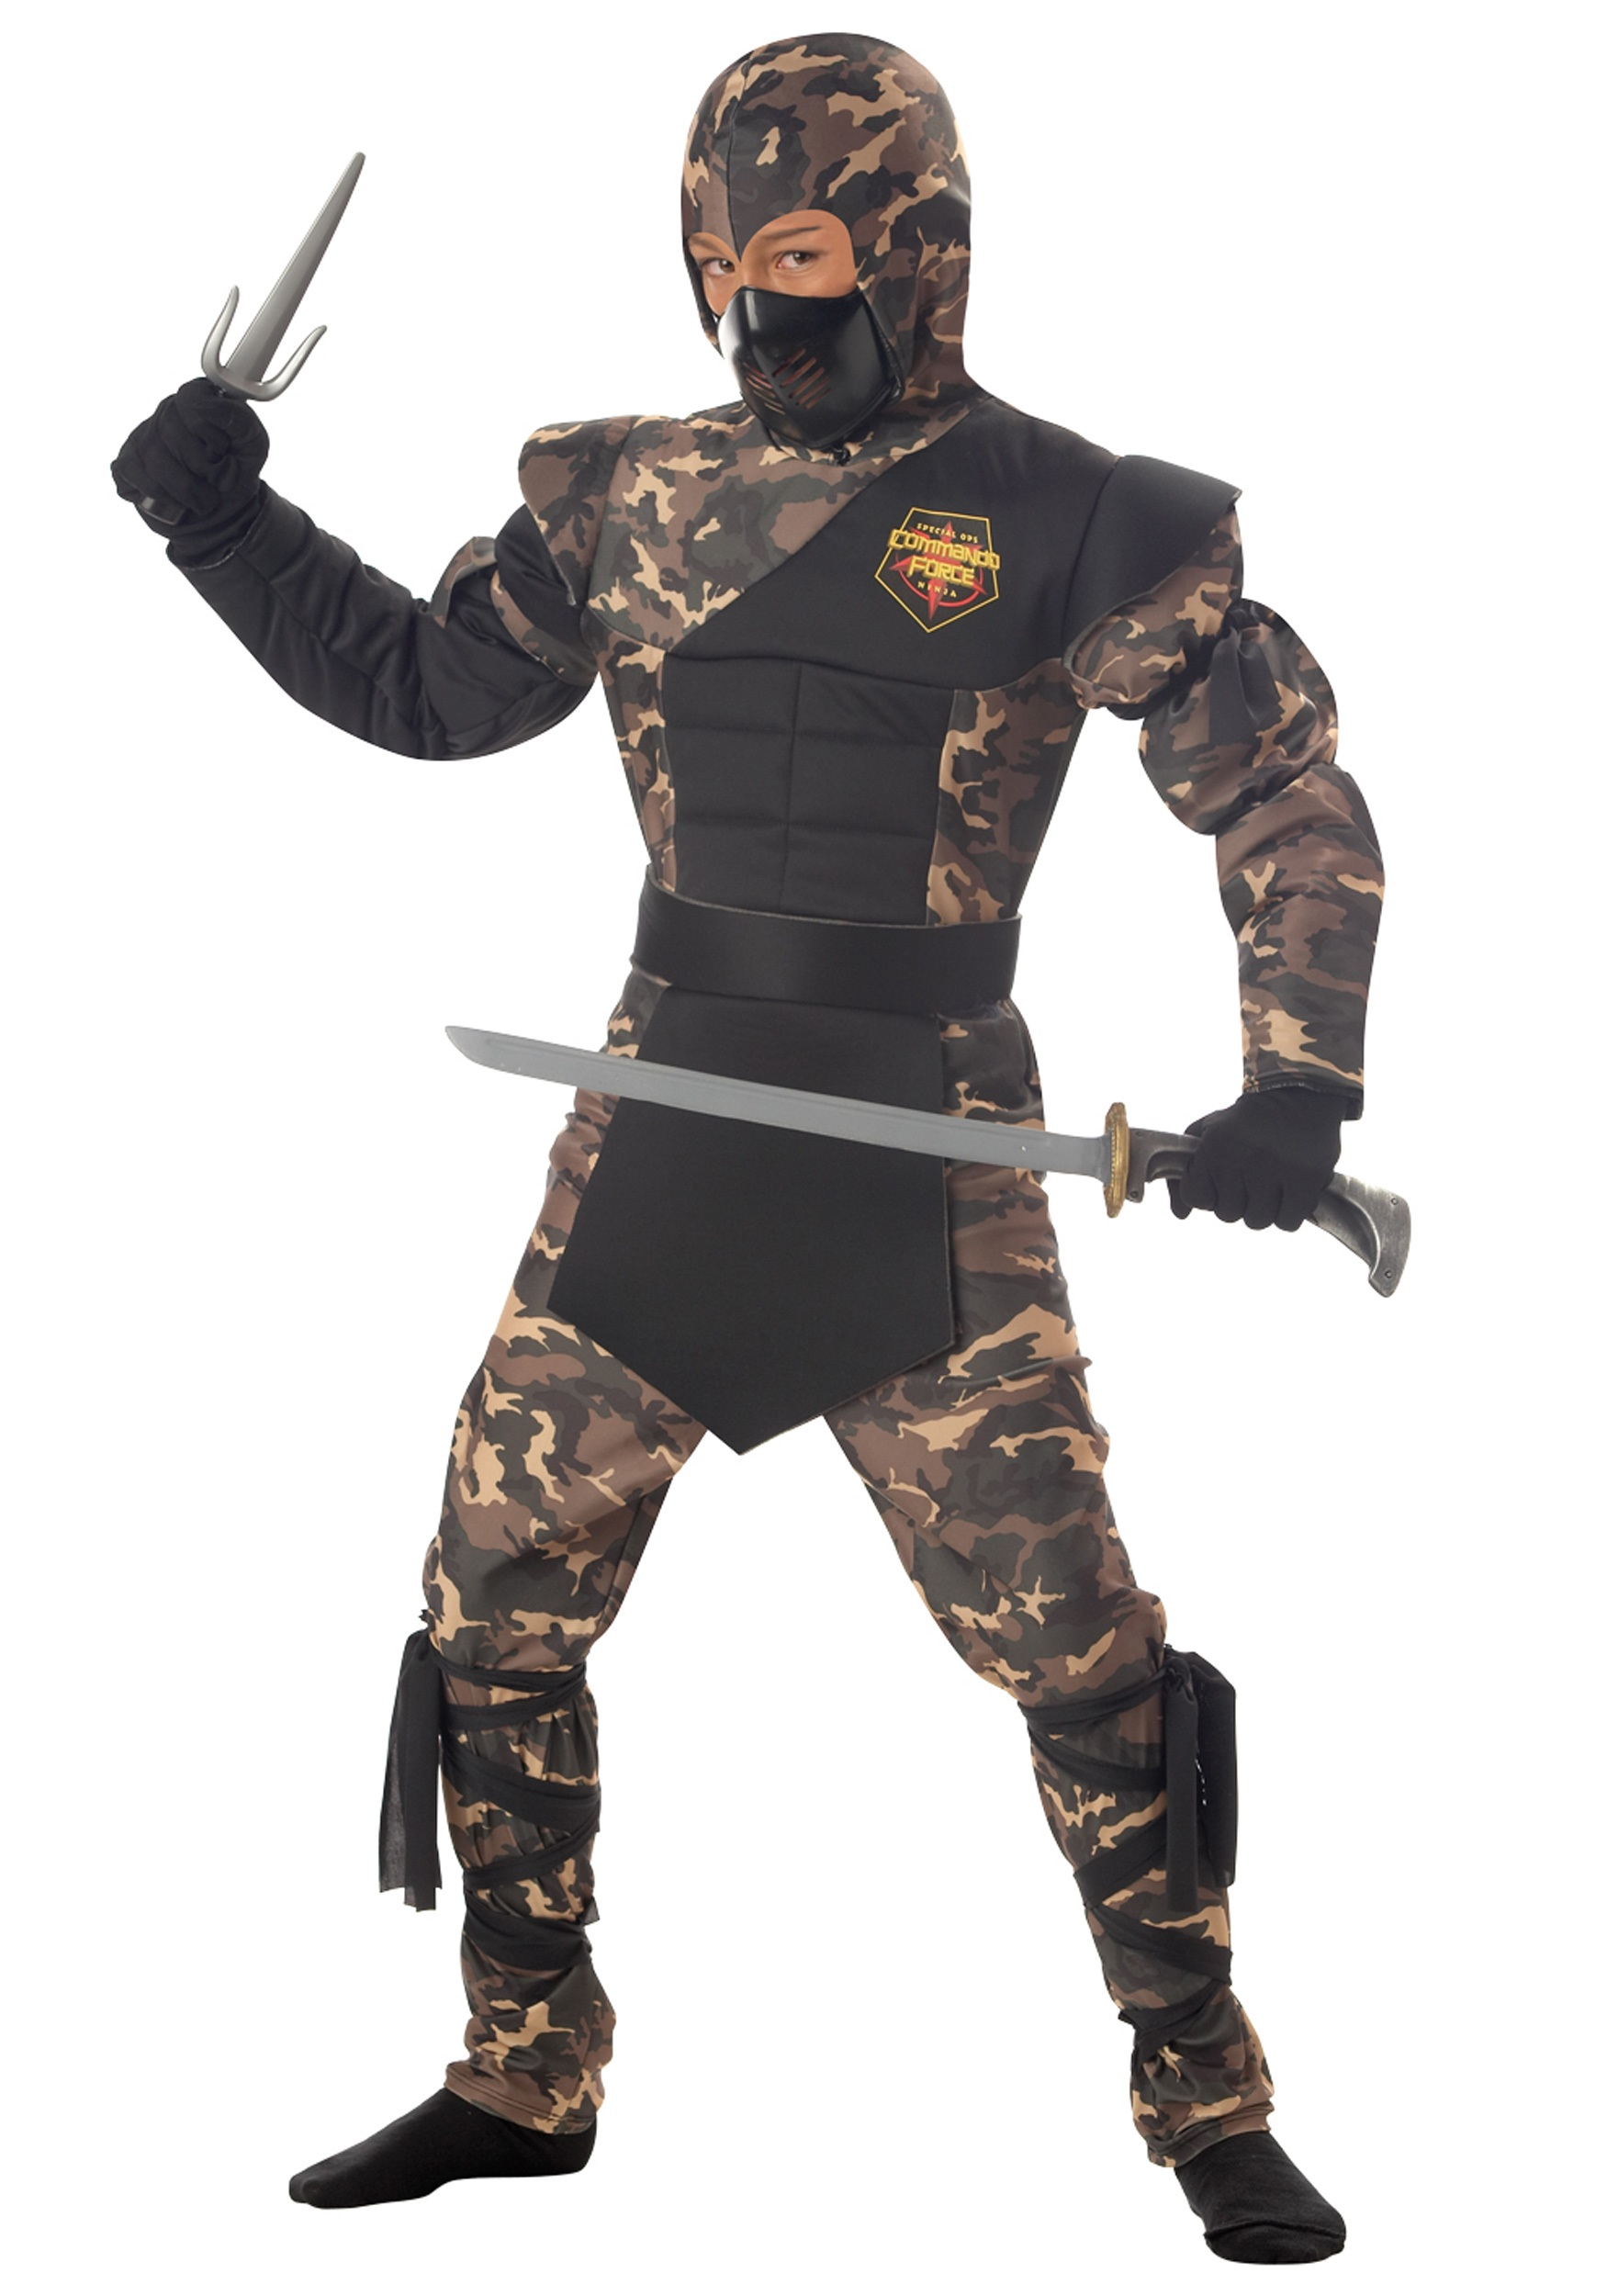 Kids Camouflage Ninja Costume  sc 1 st  Halloween Costume & Kids Camouflage Ninja Costume - Boys Ninja Halloween Costumes